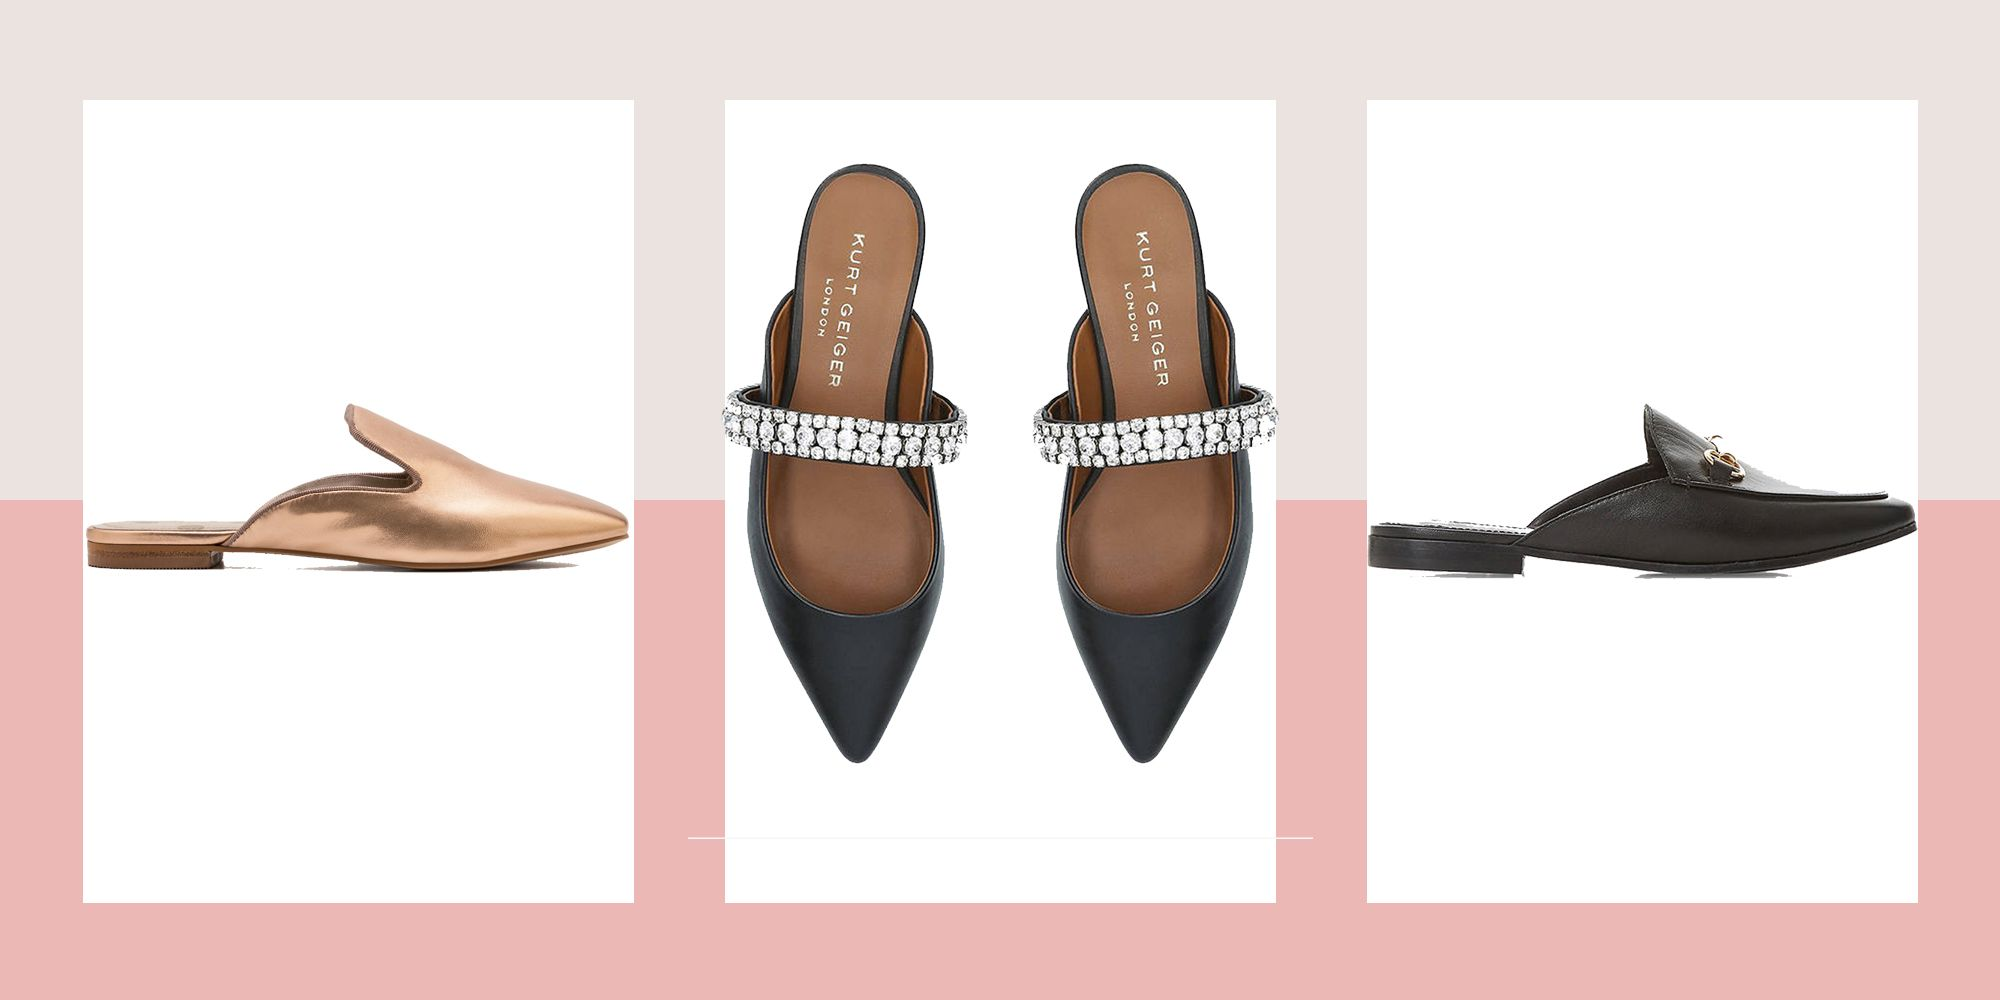 Best Fashion Vintage Back In MulesThe Footwear Trend That's